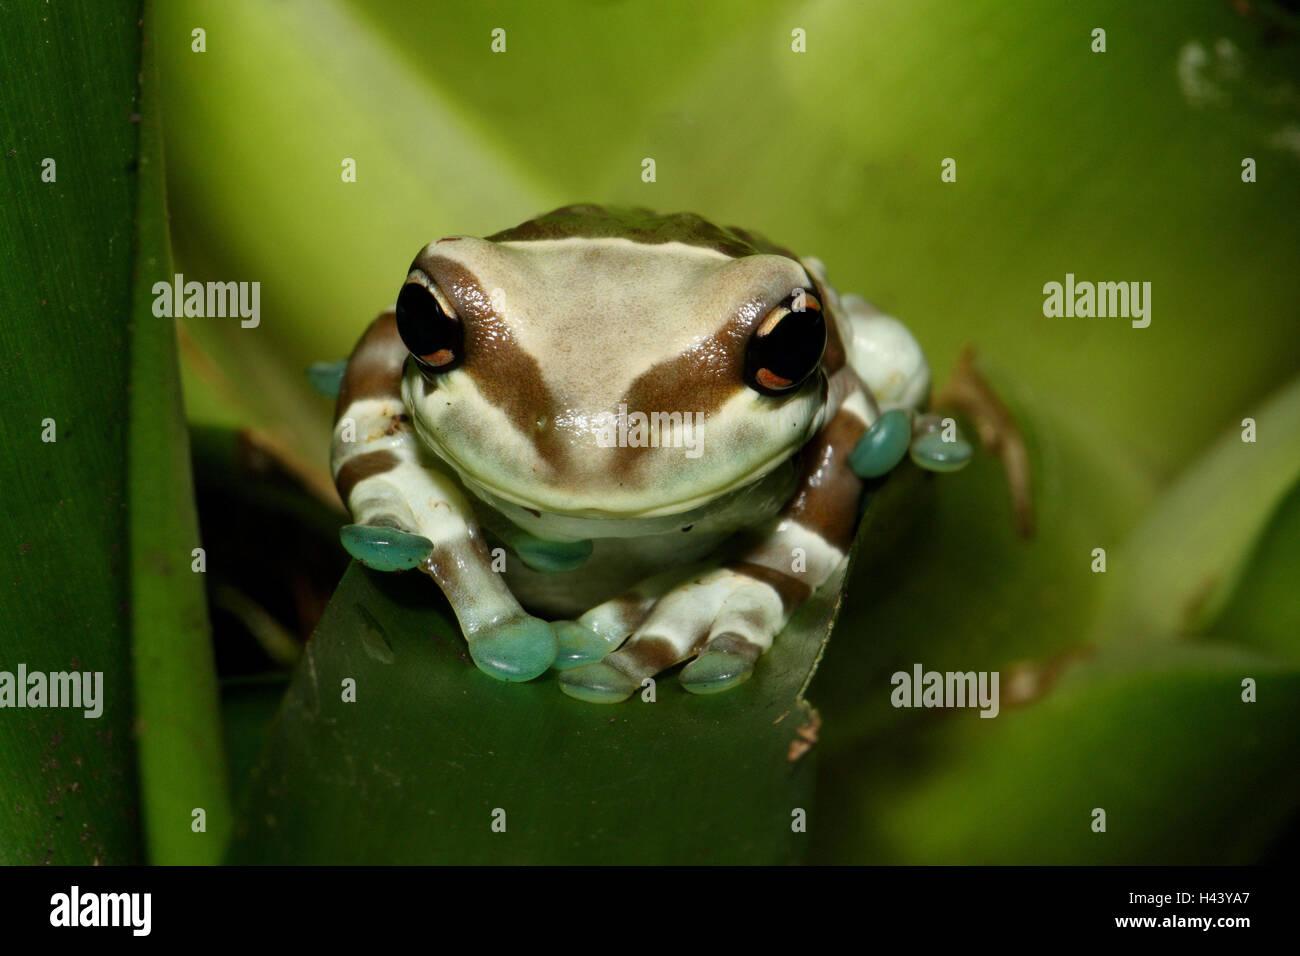 Toad foliage frog, leaves, sit, portrait, tree pits-toad foliage frog, frog, foliage frog, frog Amphibian, amphibian, - Stock Image